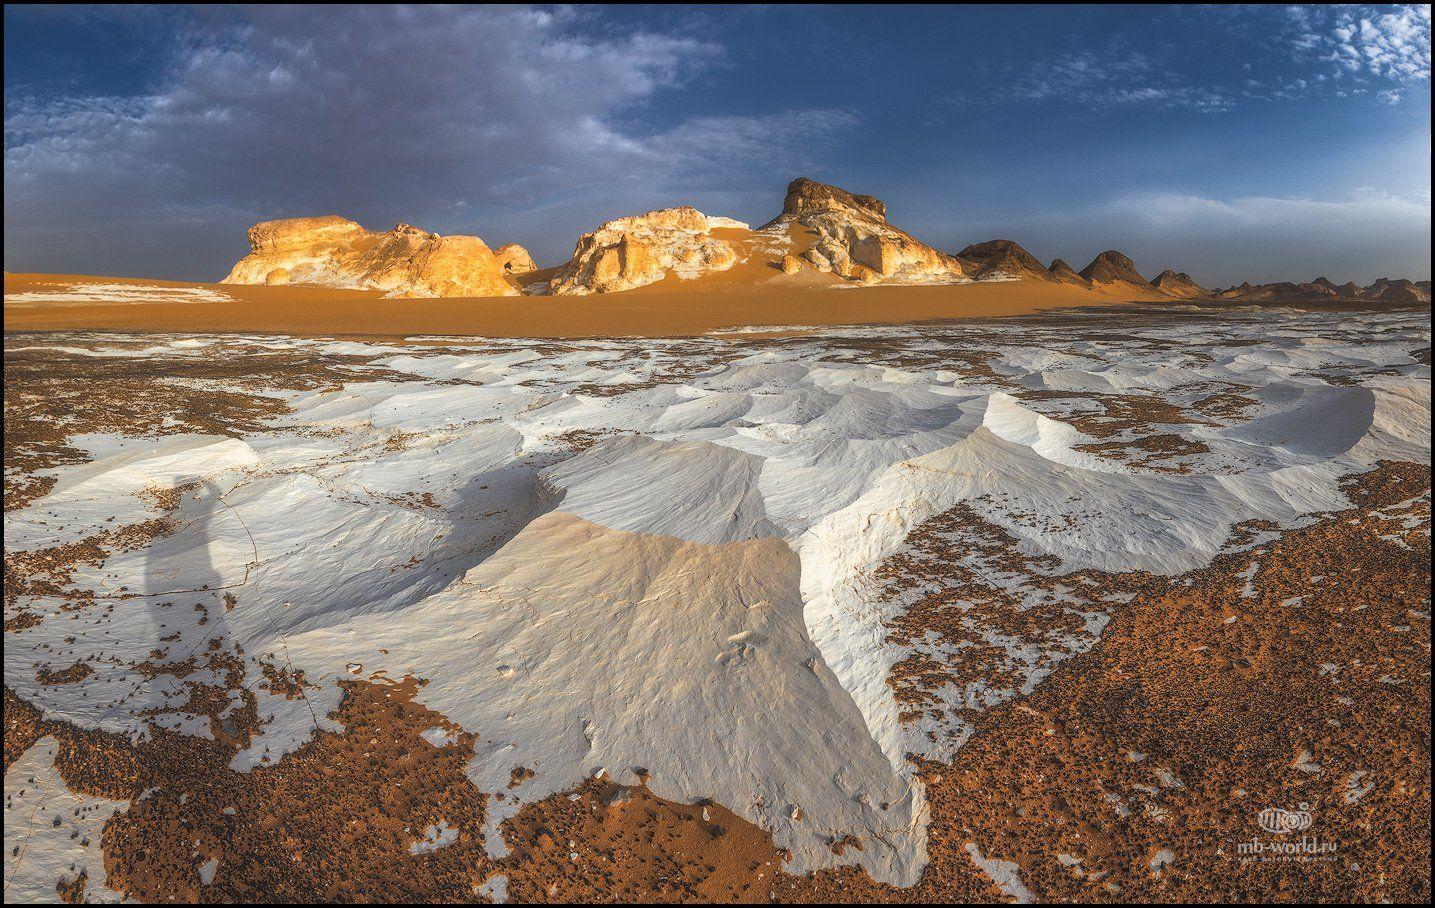 Египет, белая пустыня, рассвет, западная пустыня, , Mikhail vorobyev